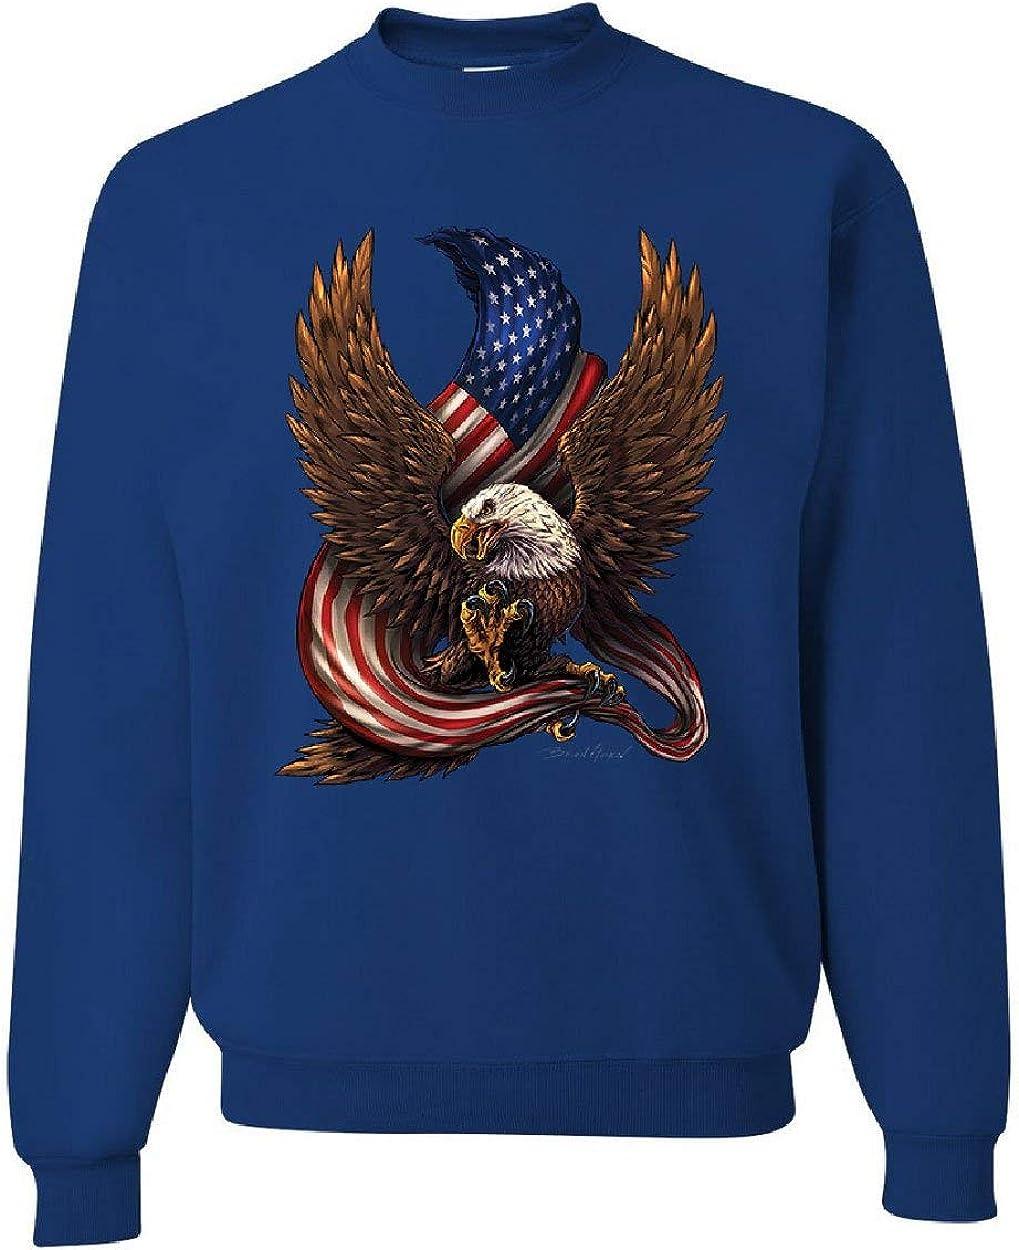 USA Stars and お得なキャンペーンを実施中 Stripes Sweatshirt Patriot 人気ブランド多数対象 American Eag Bald Pride